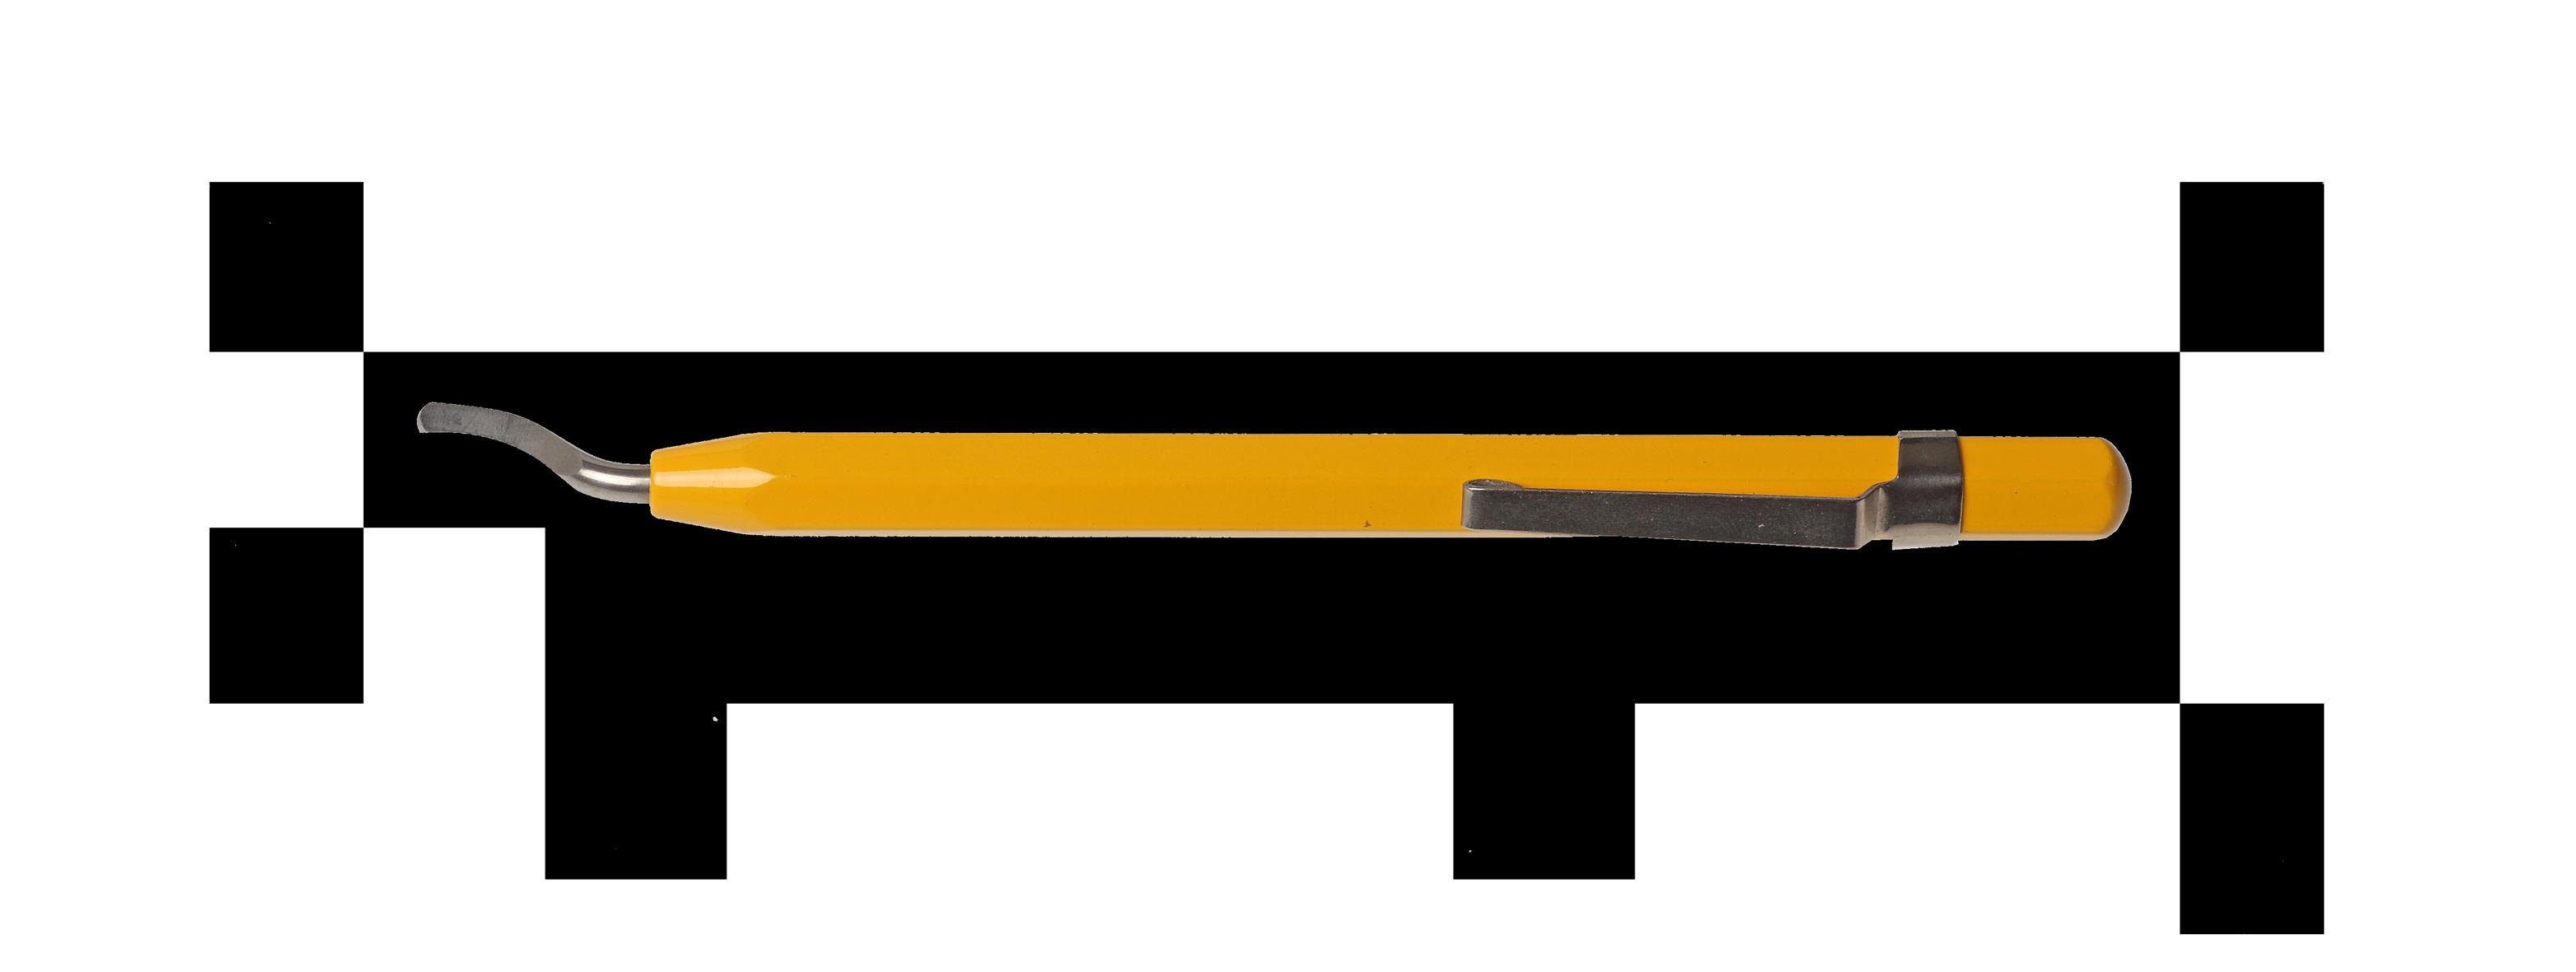 ALU-Handgriff <br/>E100, fix Image